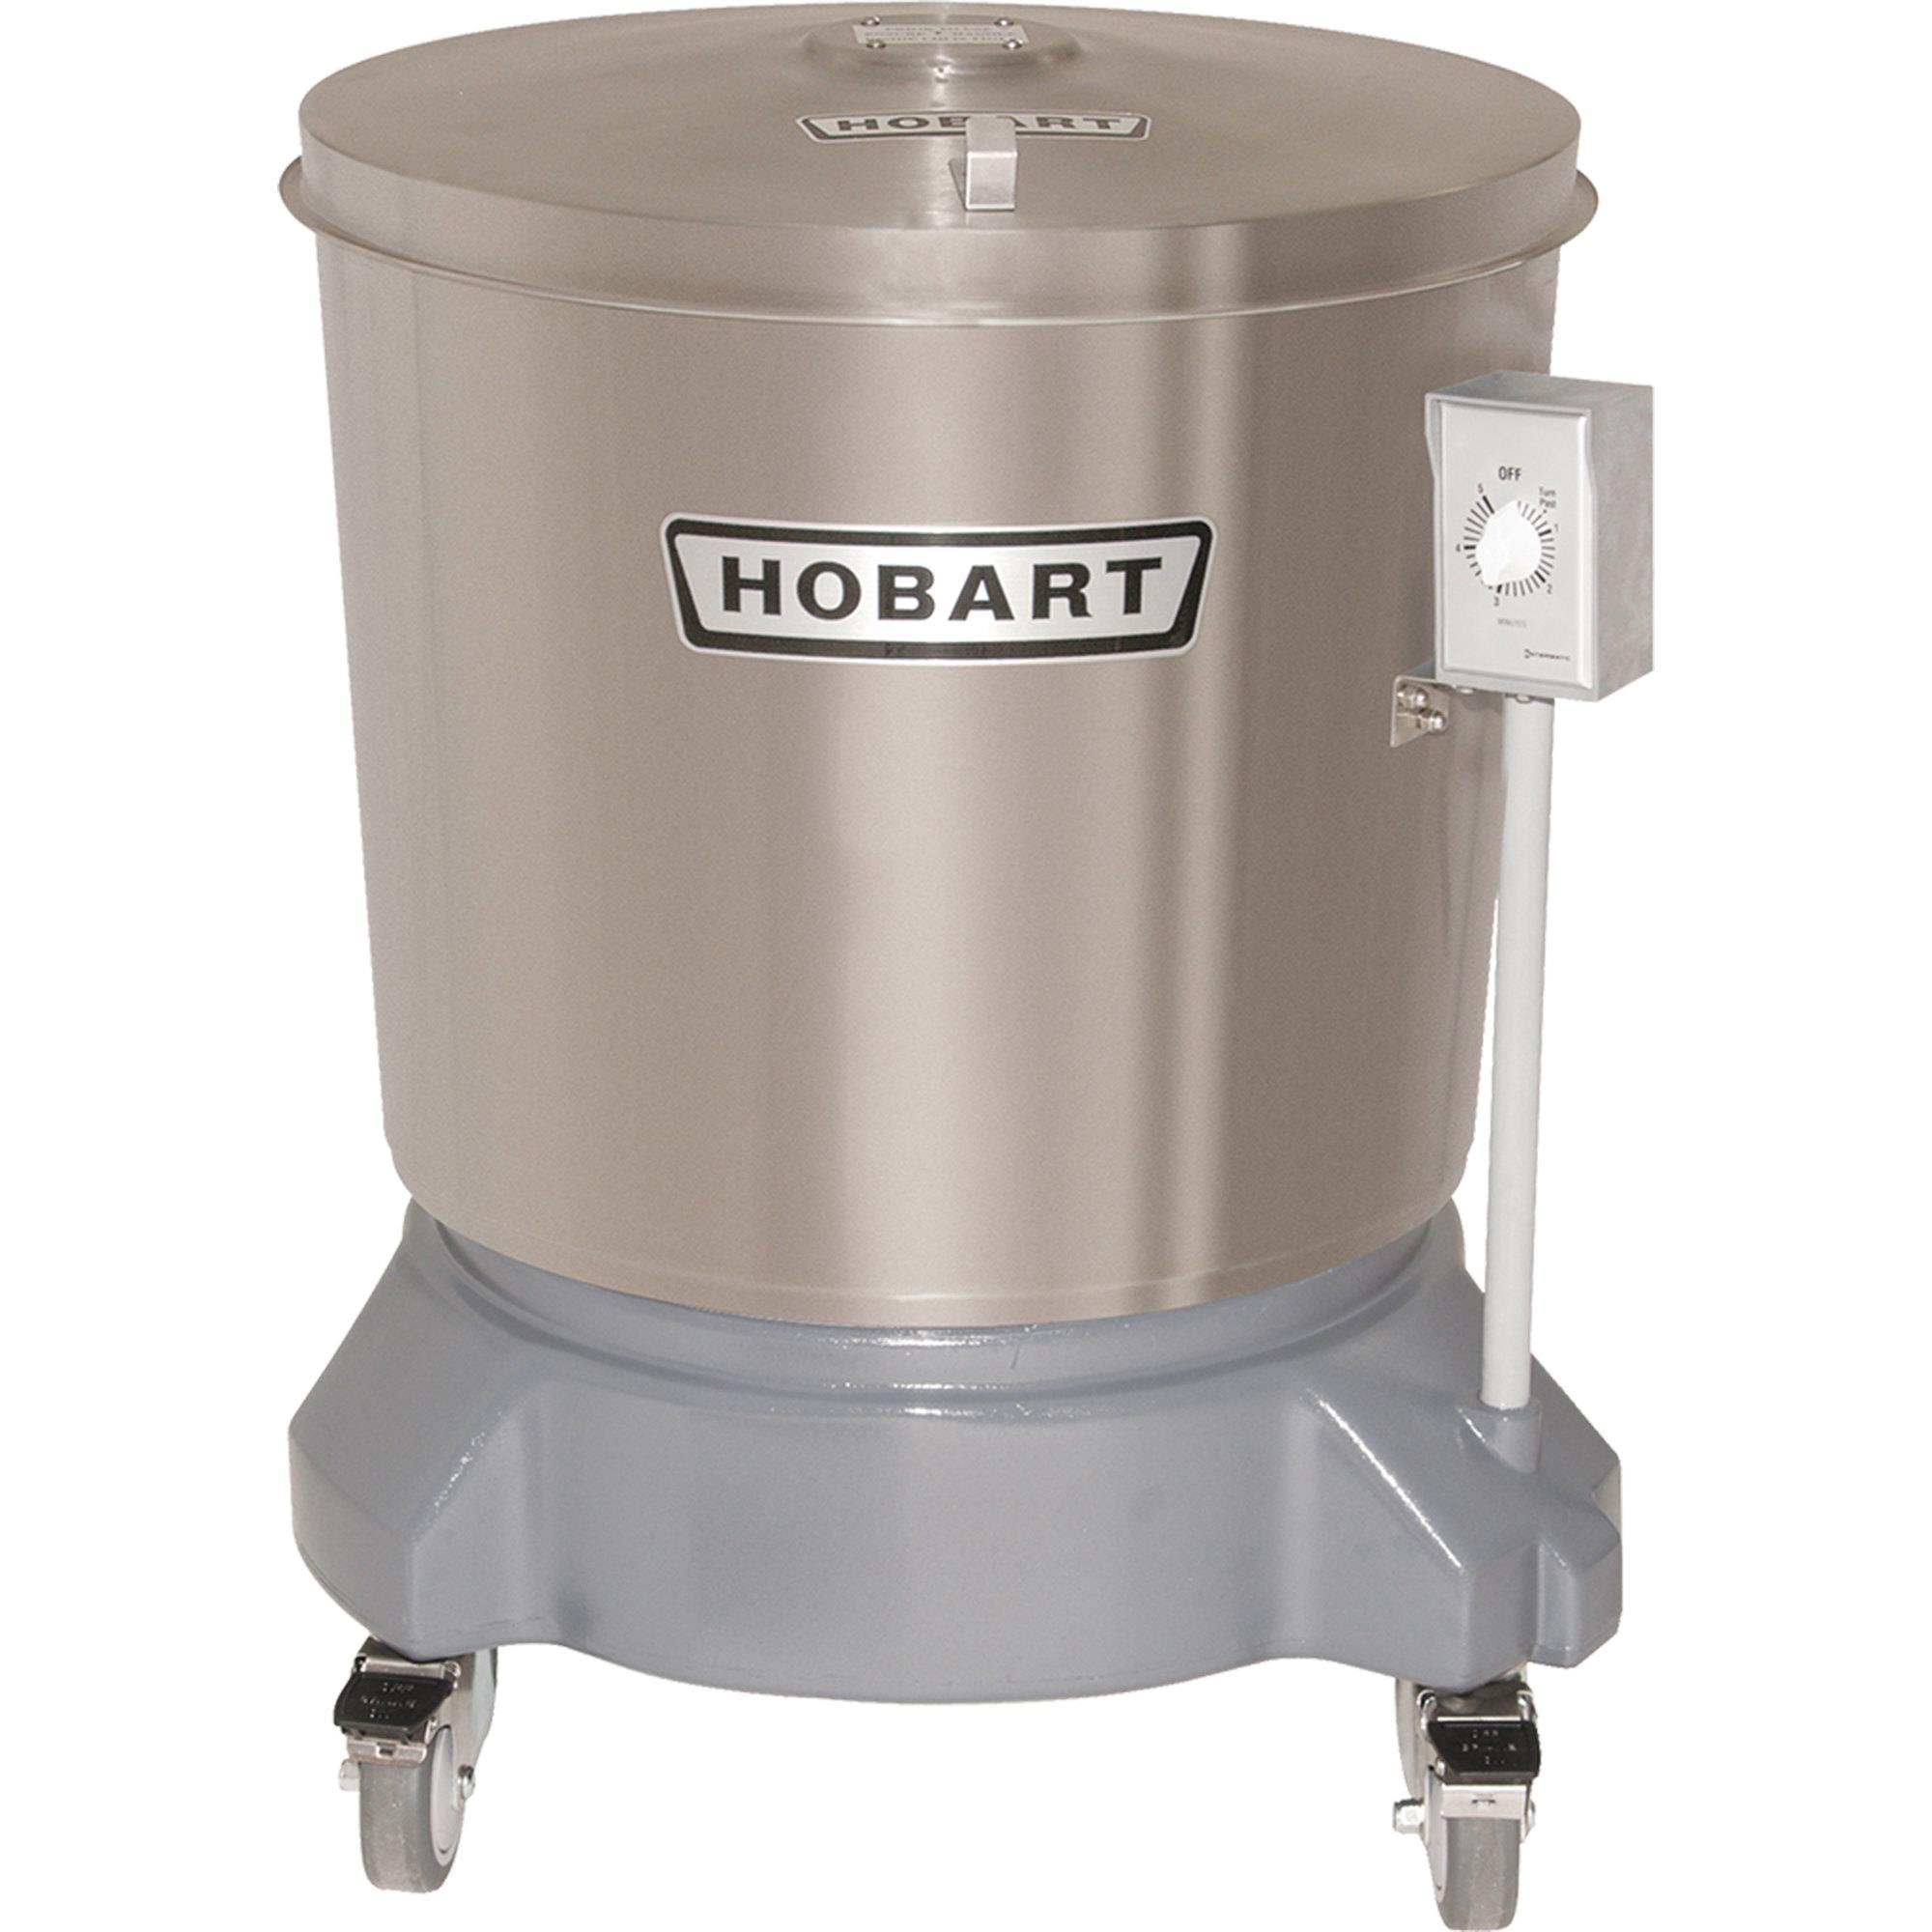 Hobart Sdps 11 20 Gallon Stainless Steel Salad Dryer Salad